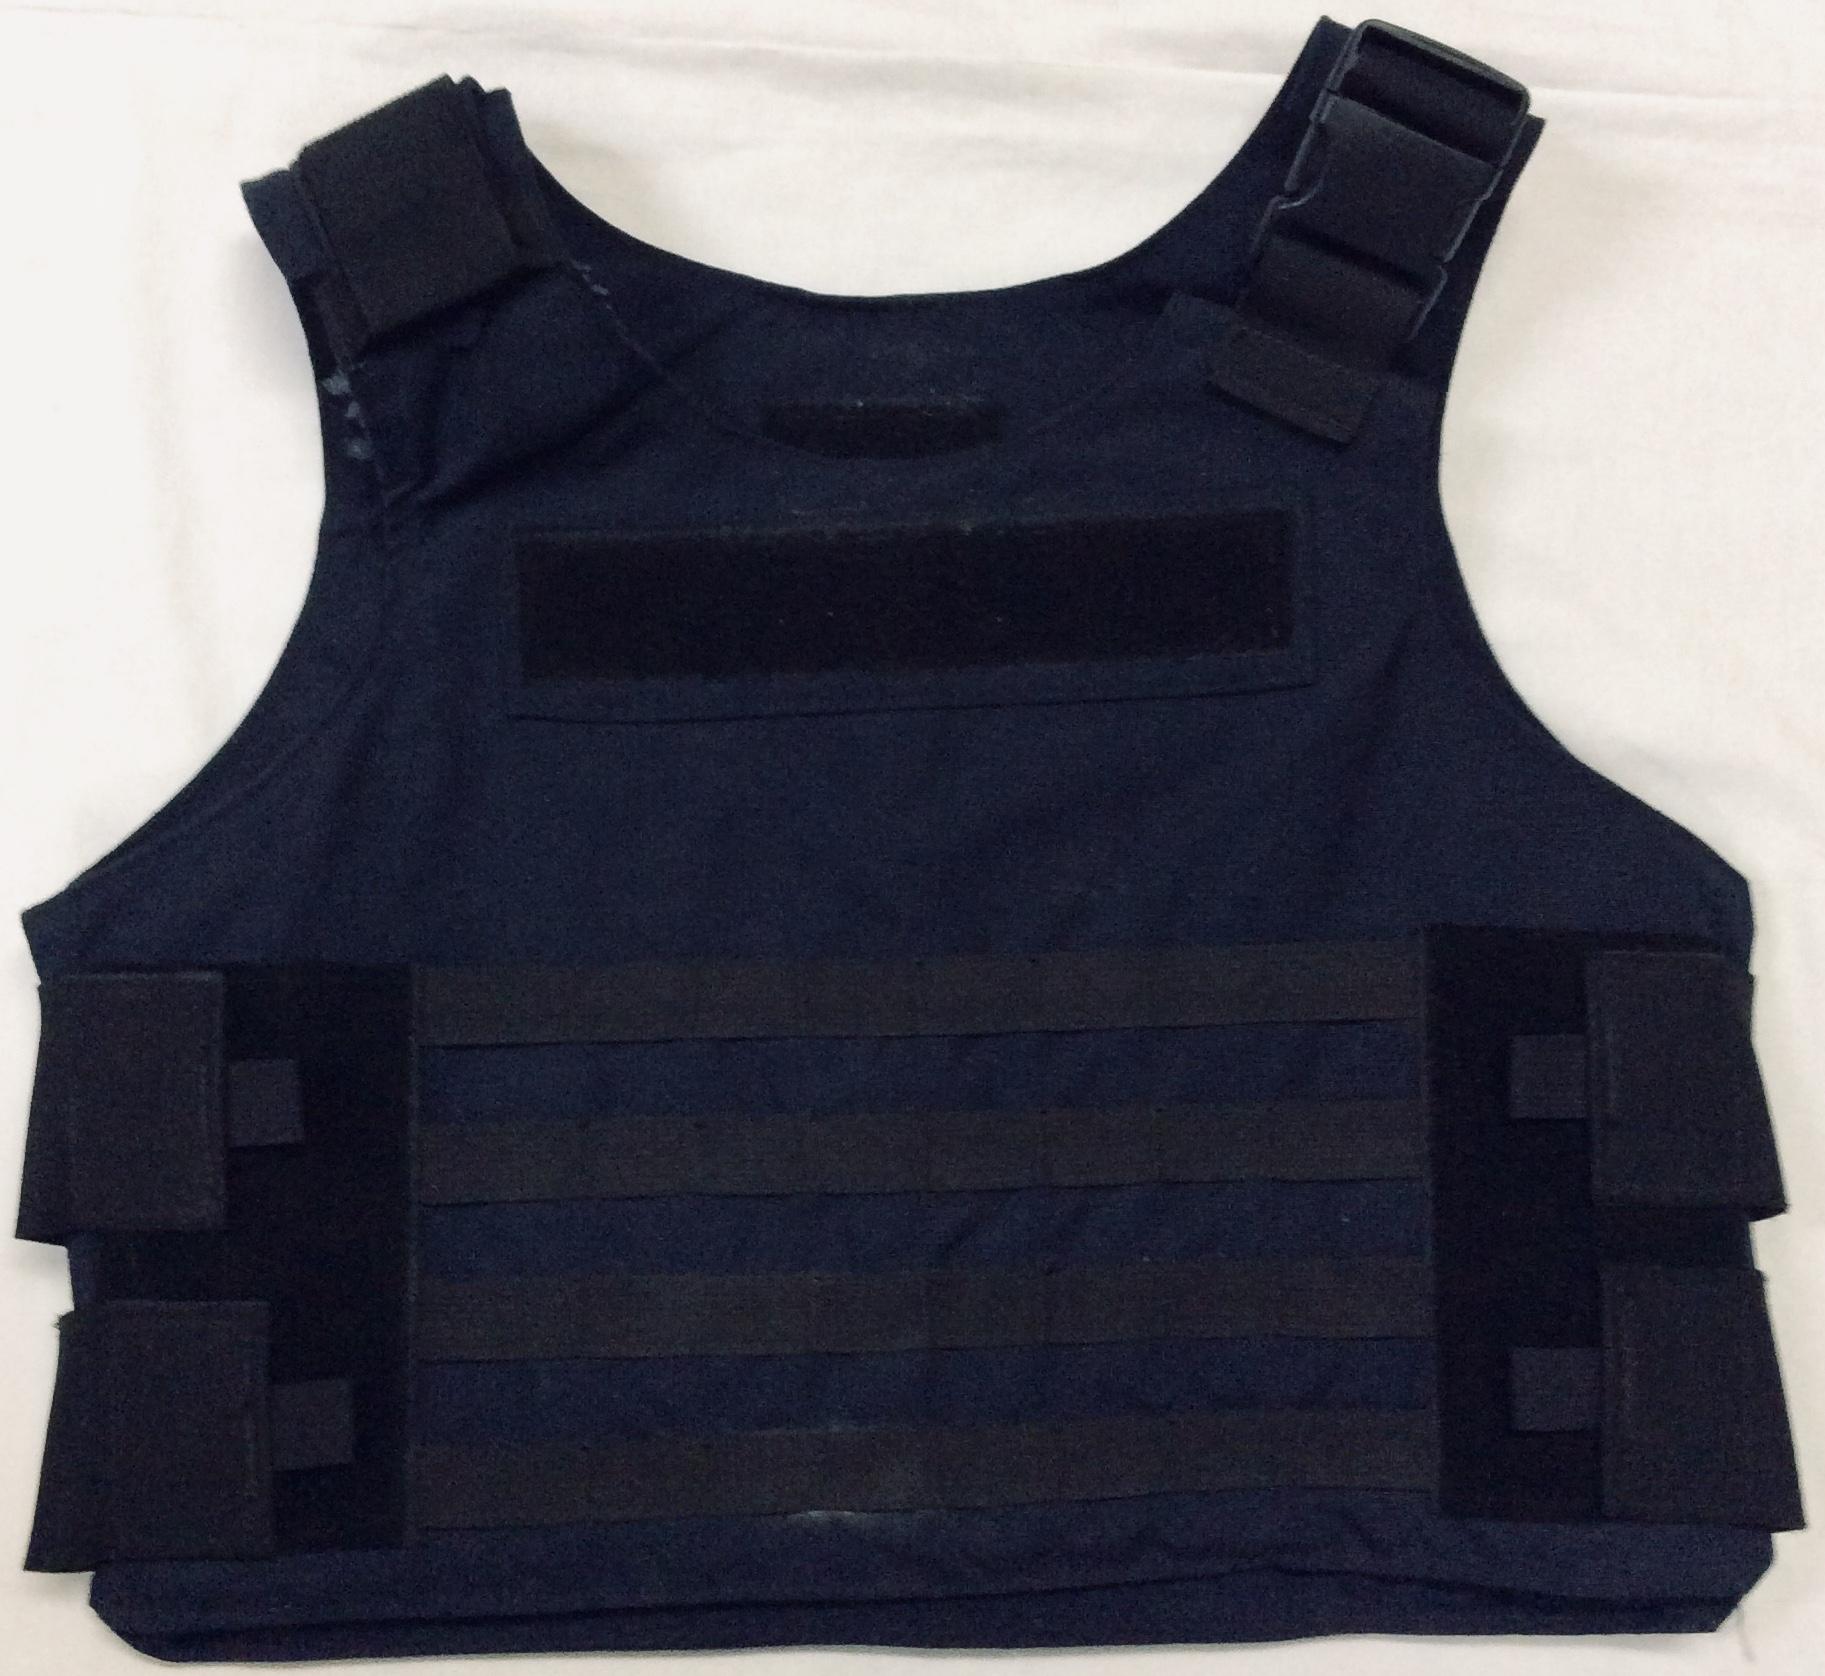 Navy blue kevlar vest with strechy